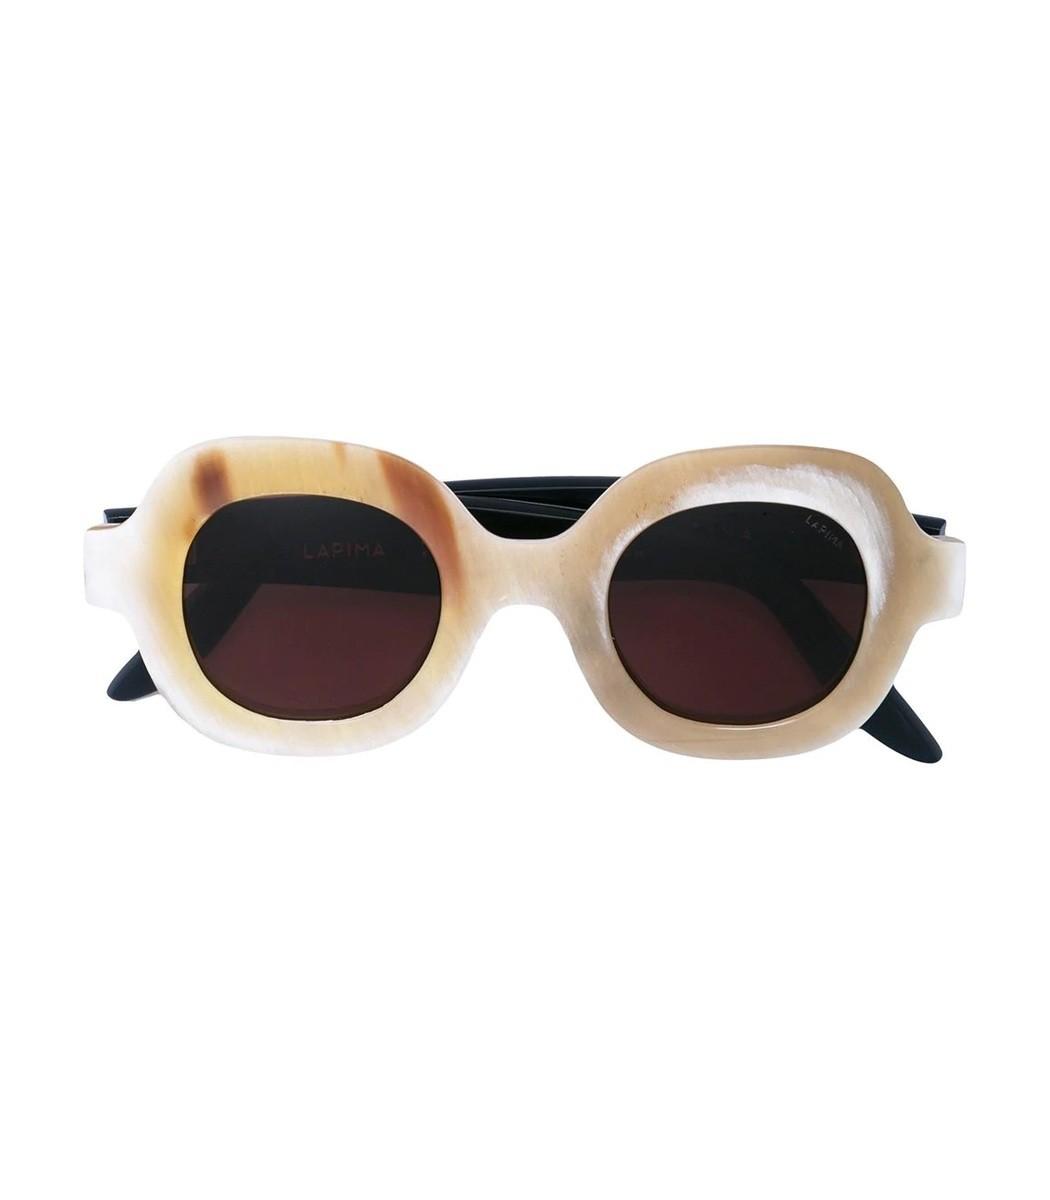 LAPIMA Cream Catarina Sunglasses